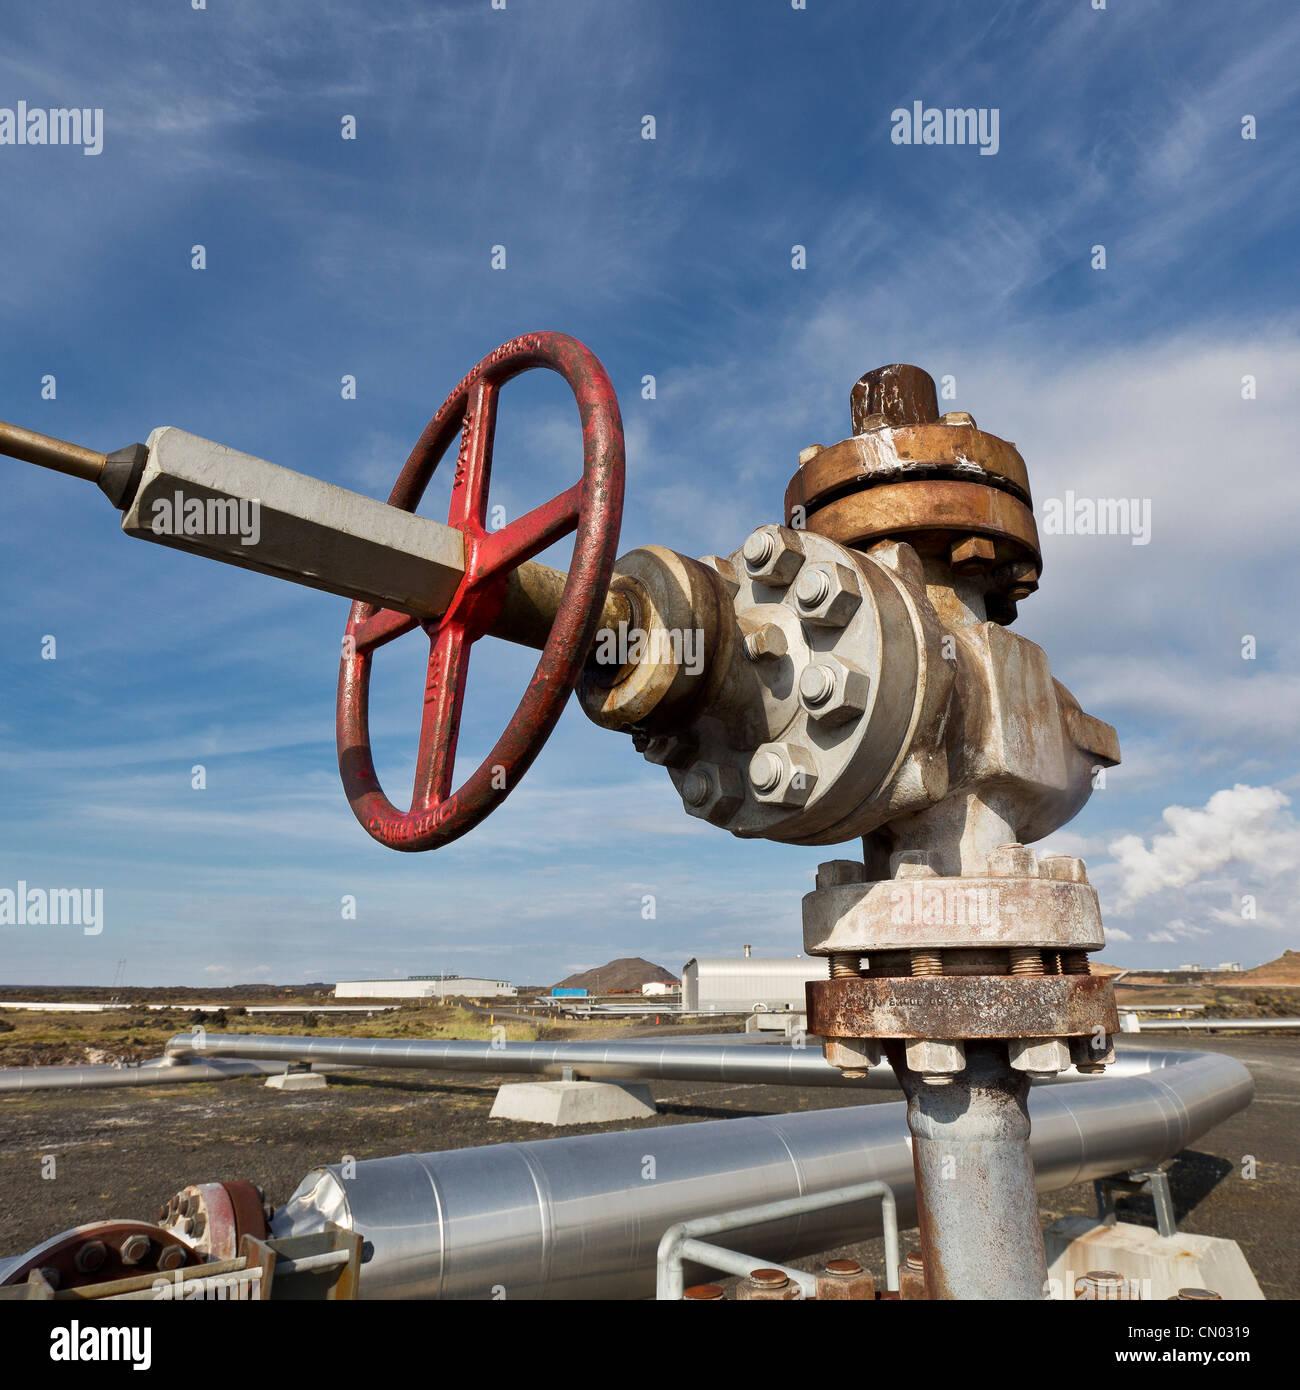 Tubos en Gunnhver Reykjanes, Central de Energía Geotérmica, península de Reykjanes, Islandia Imagen De Stock